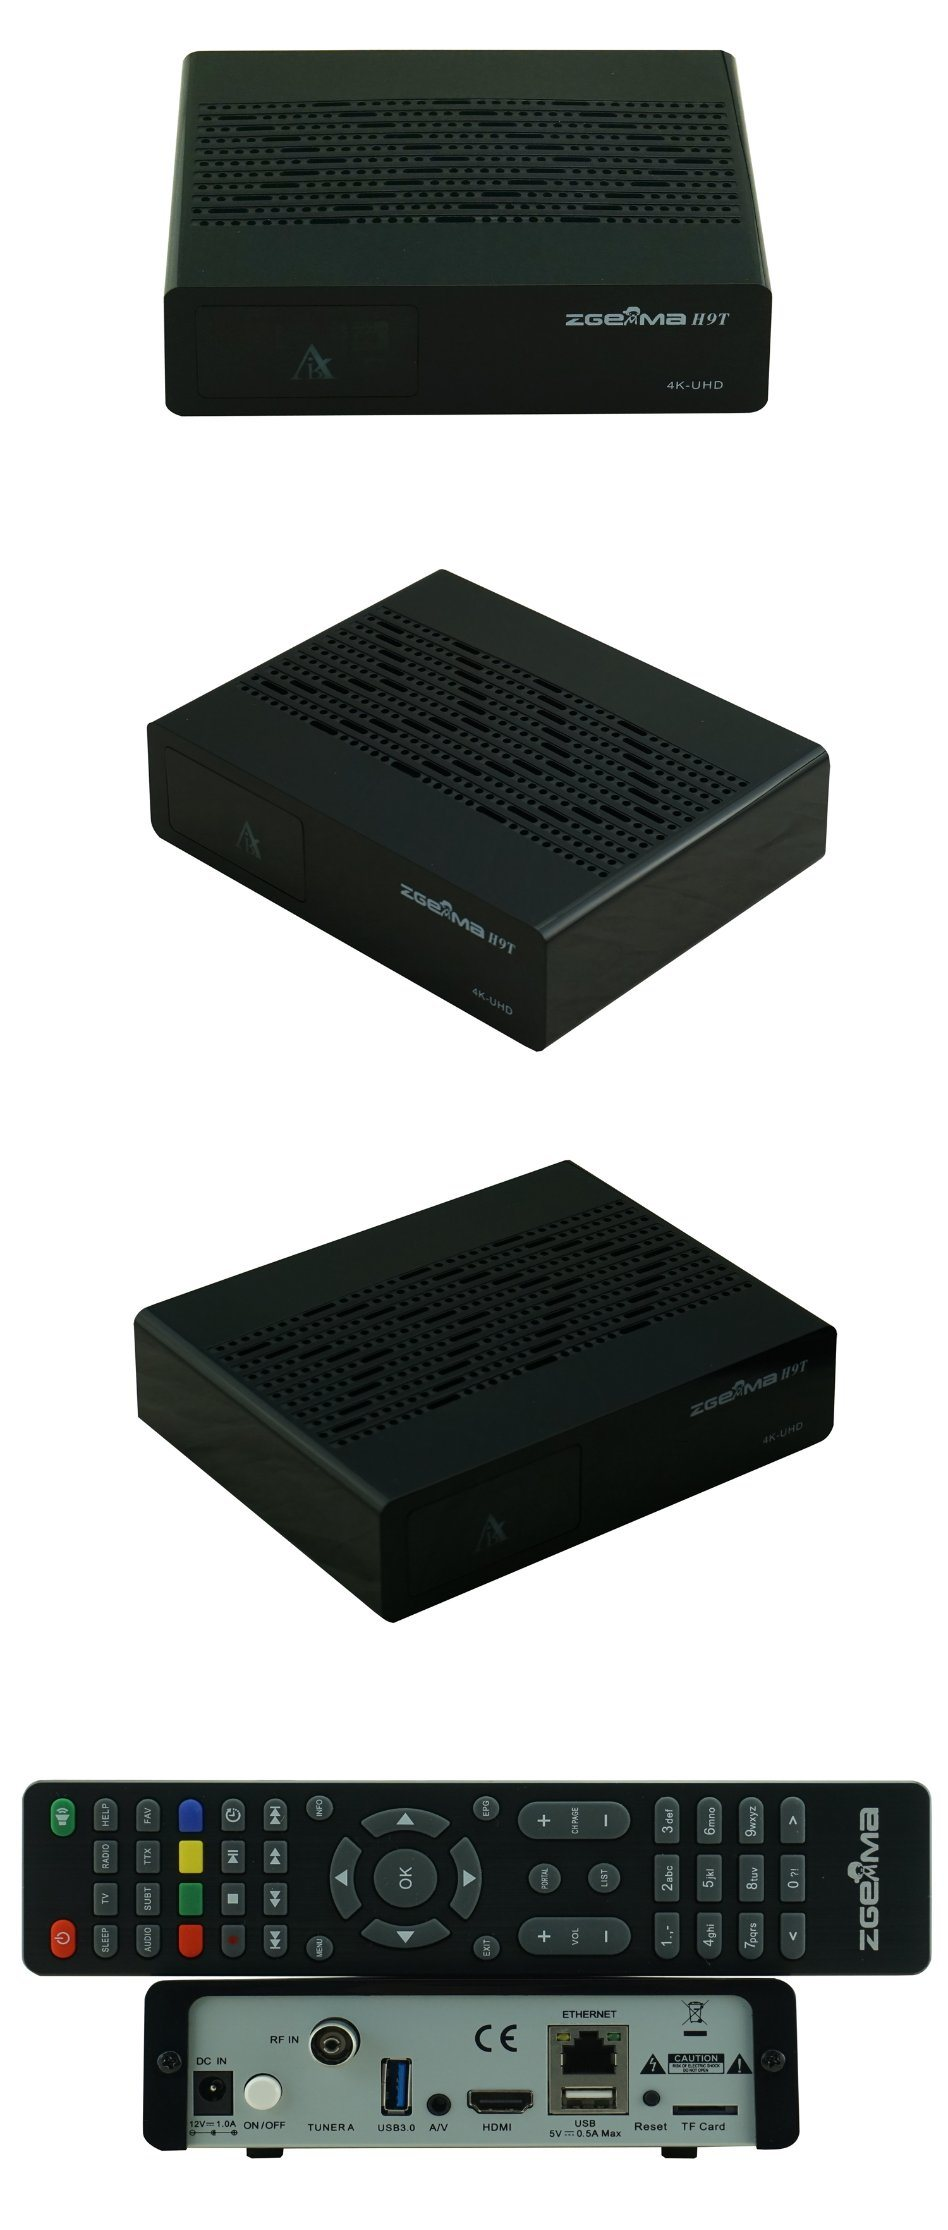 Zgemma H9t with DVB-T2/C Hybrid Tuner 4K UHD Receiver